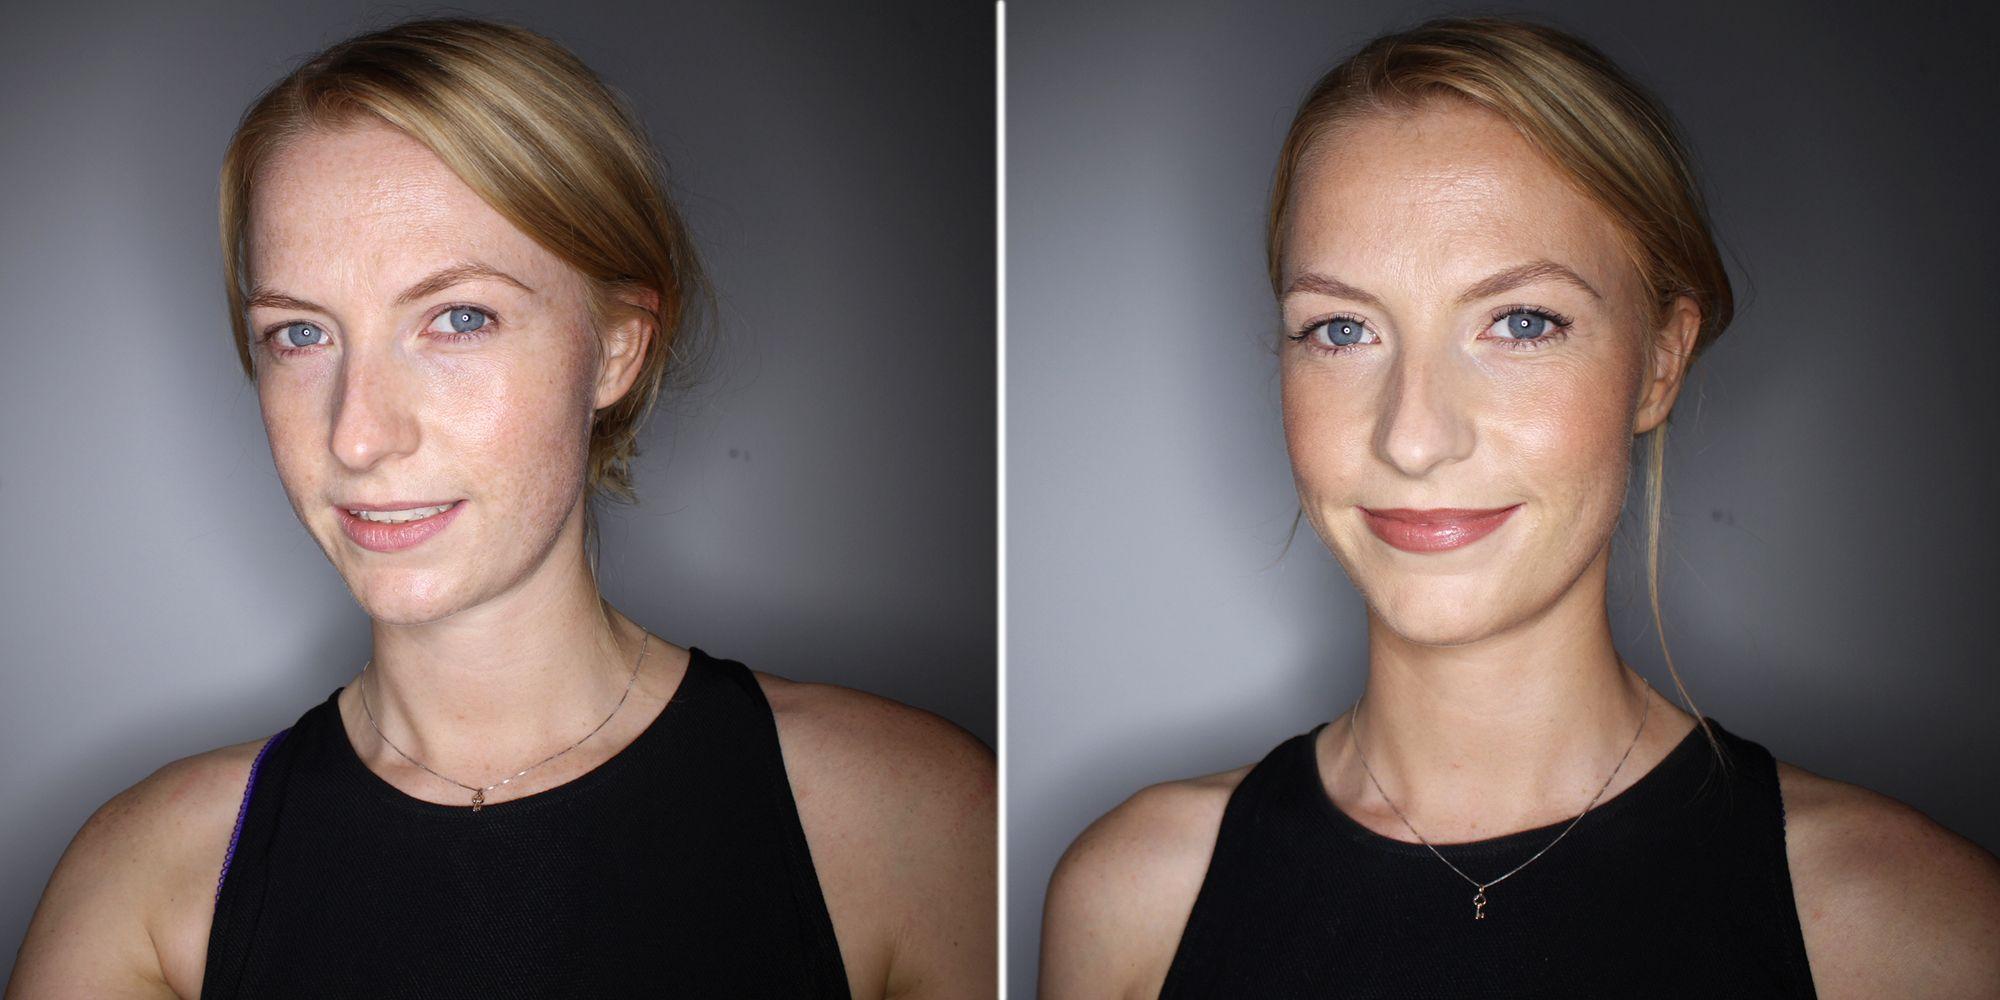 Makeup Tips For Freckles